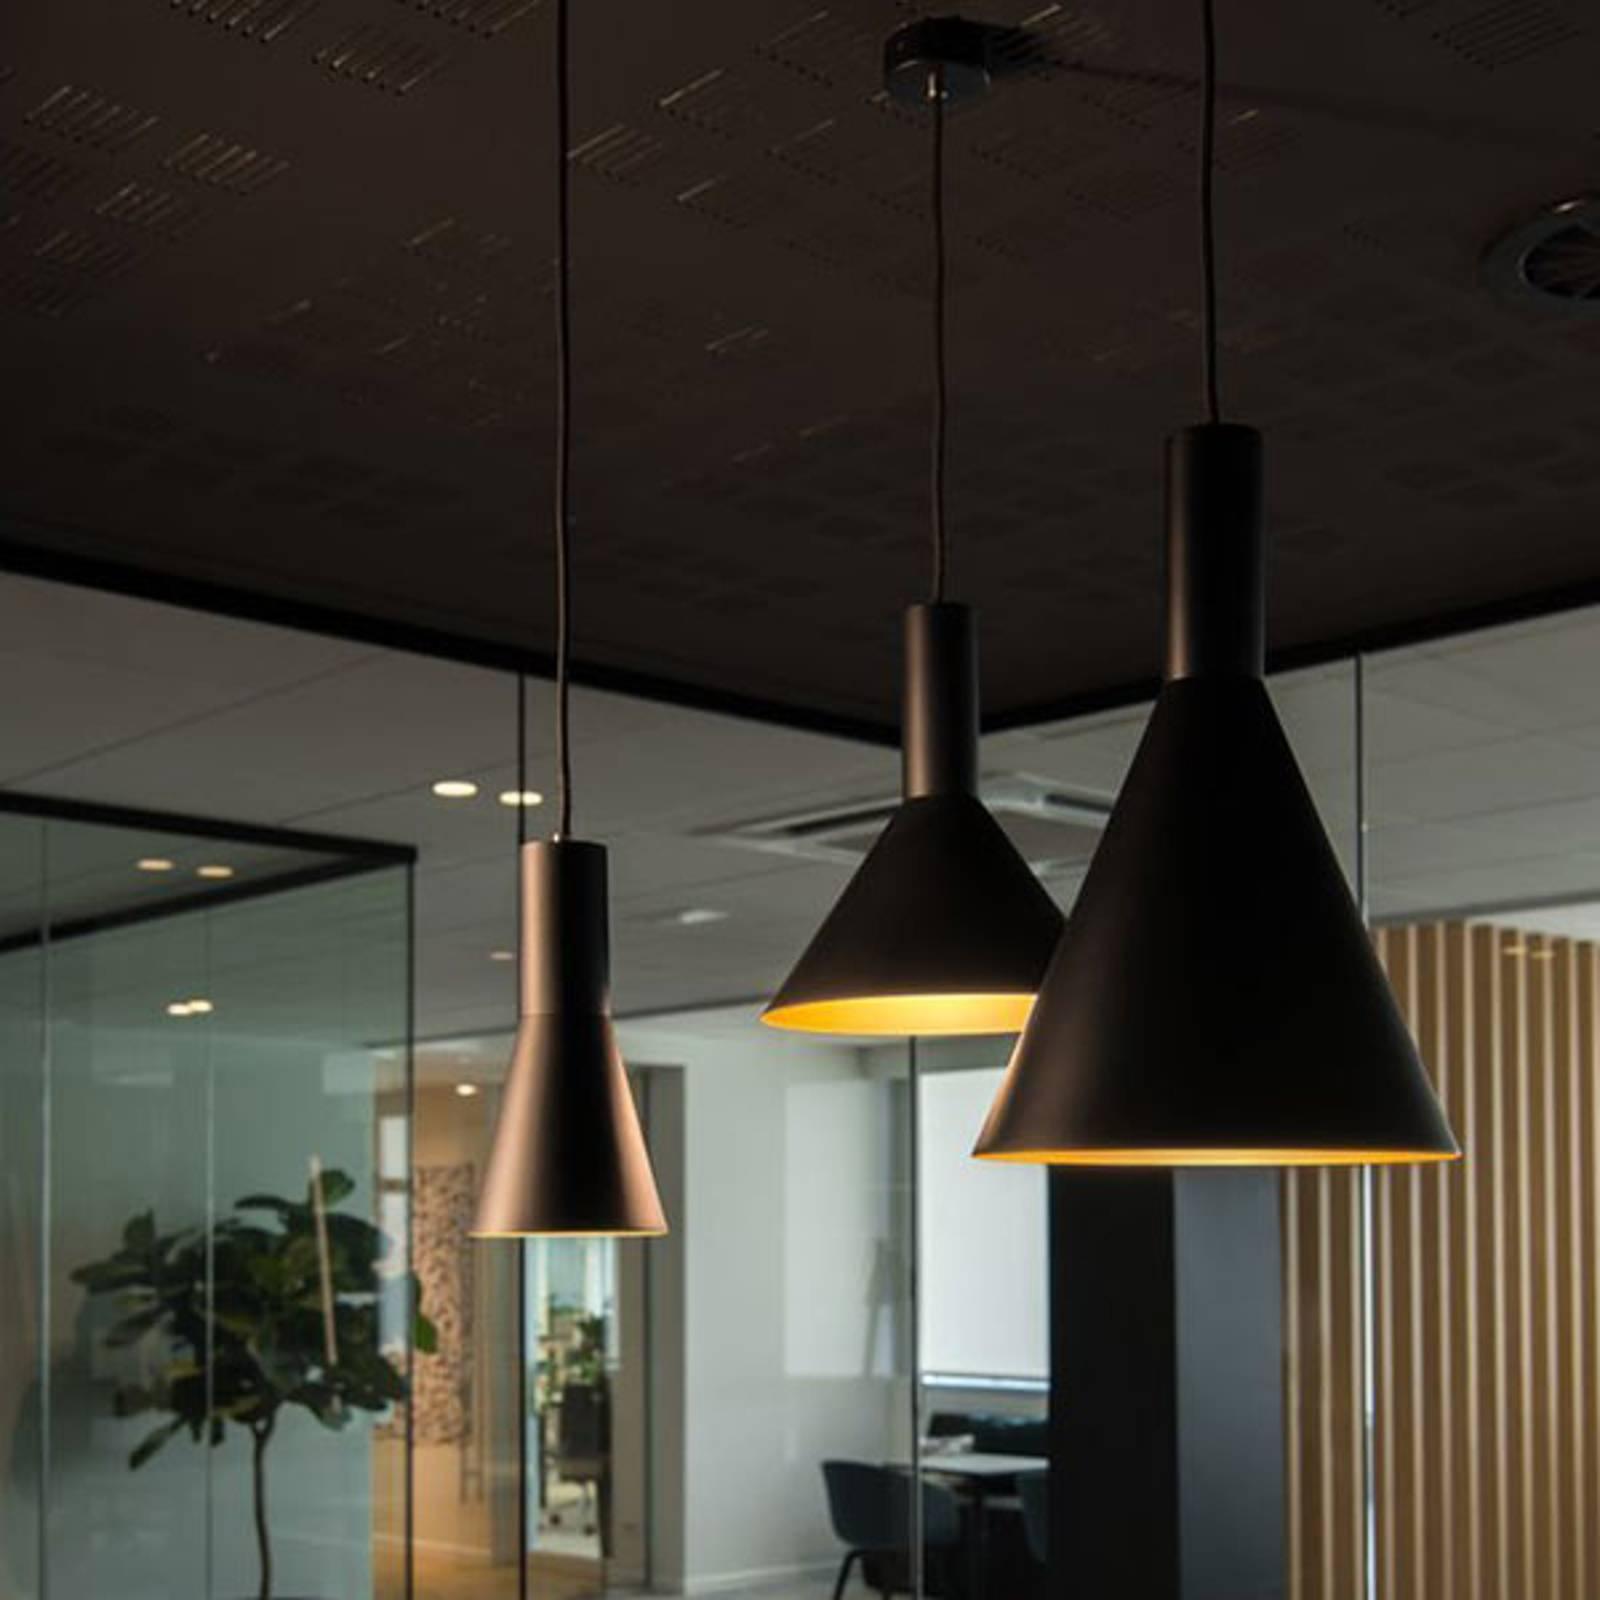 SLV Phelia hanglamp zwart/goud, Ø 27,5 cm